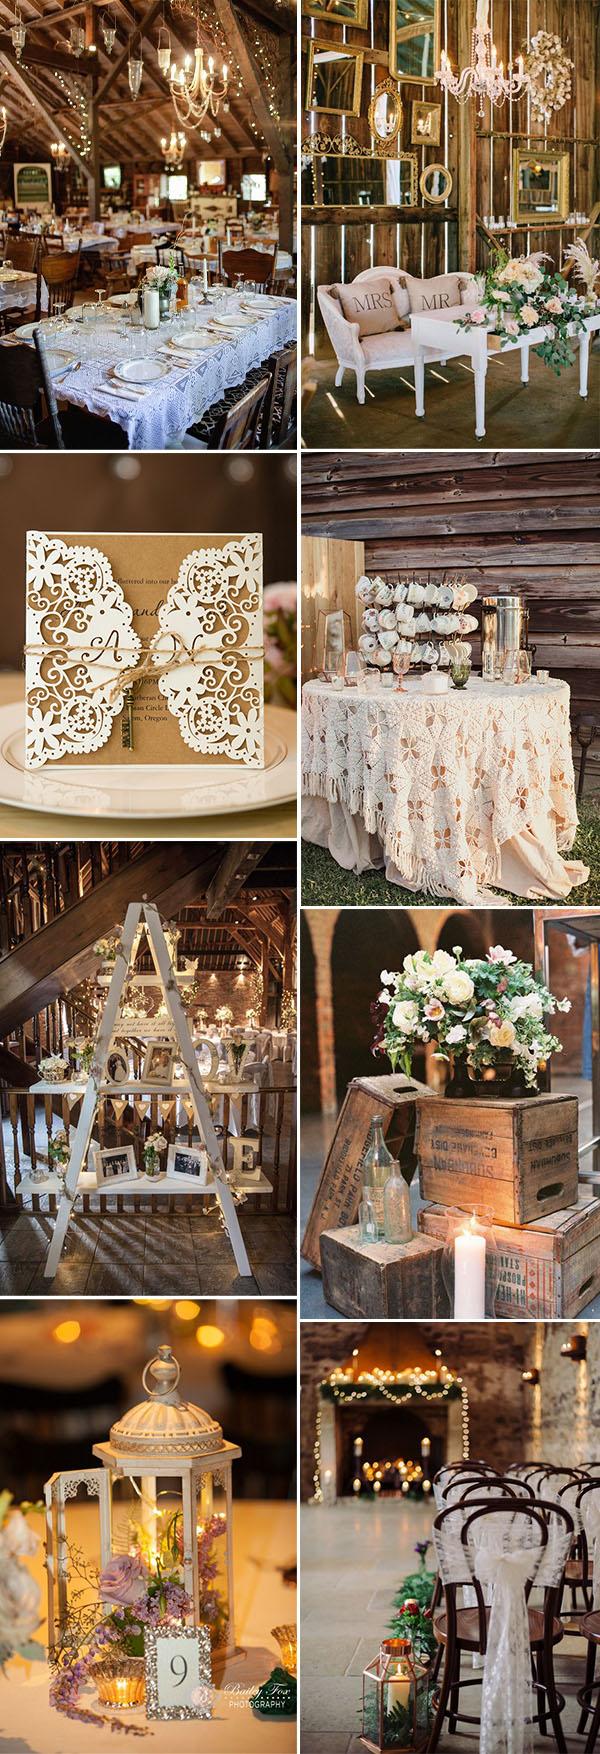 6 Awesome Vintage Wedding Theme Ideas to Inspire You